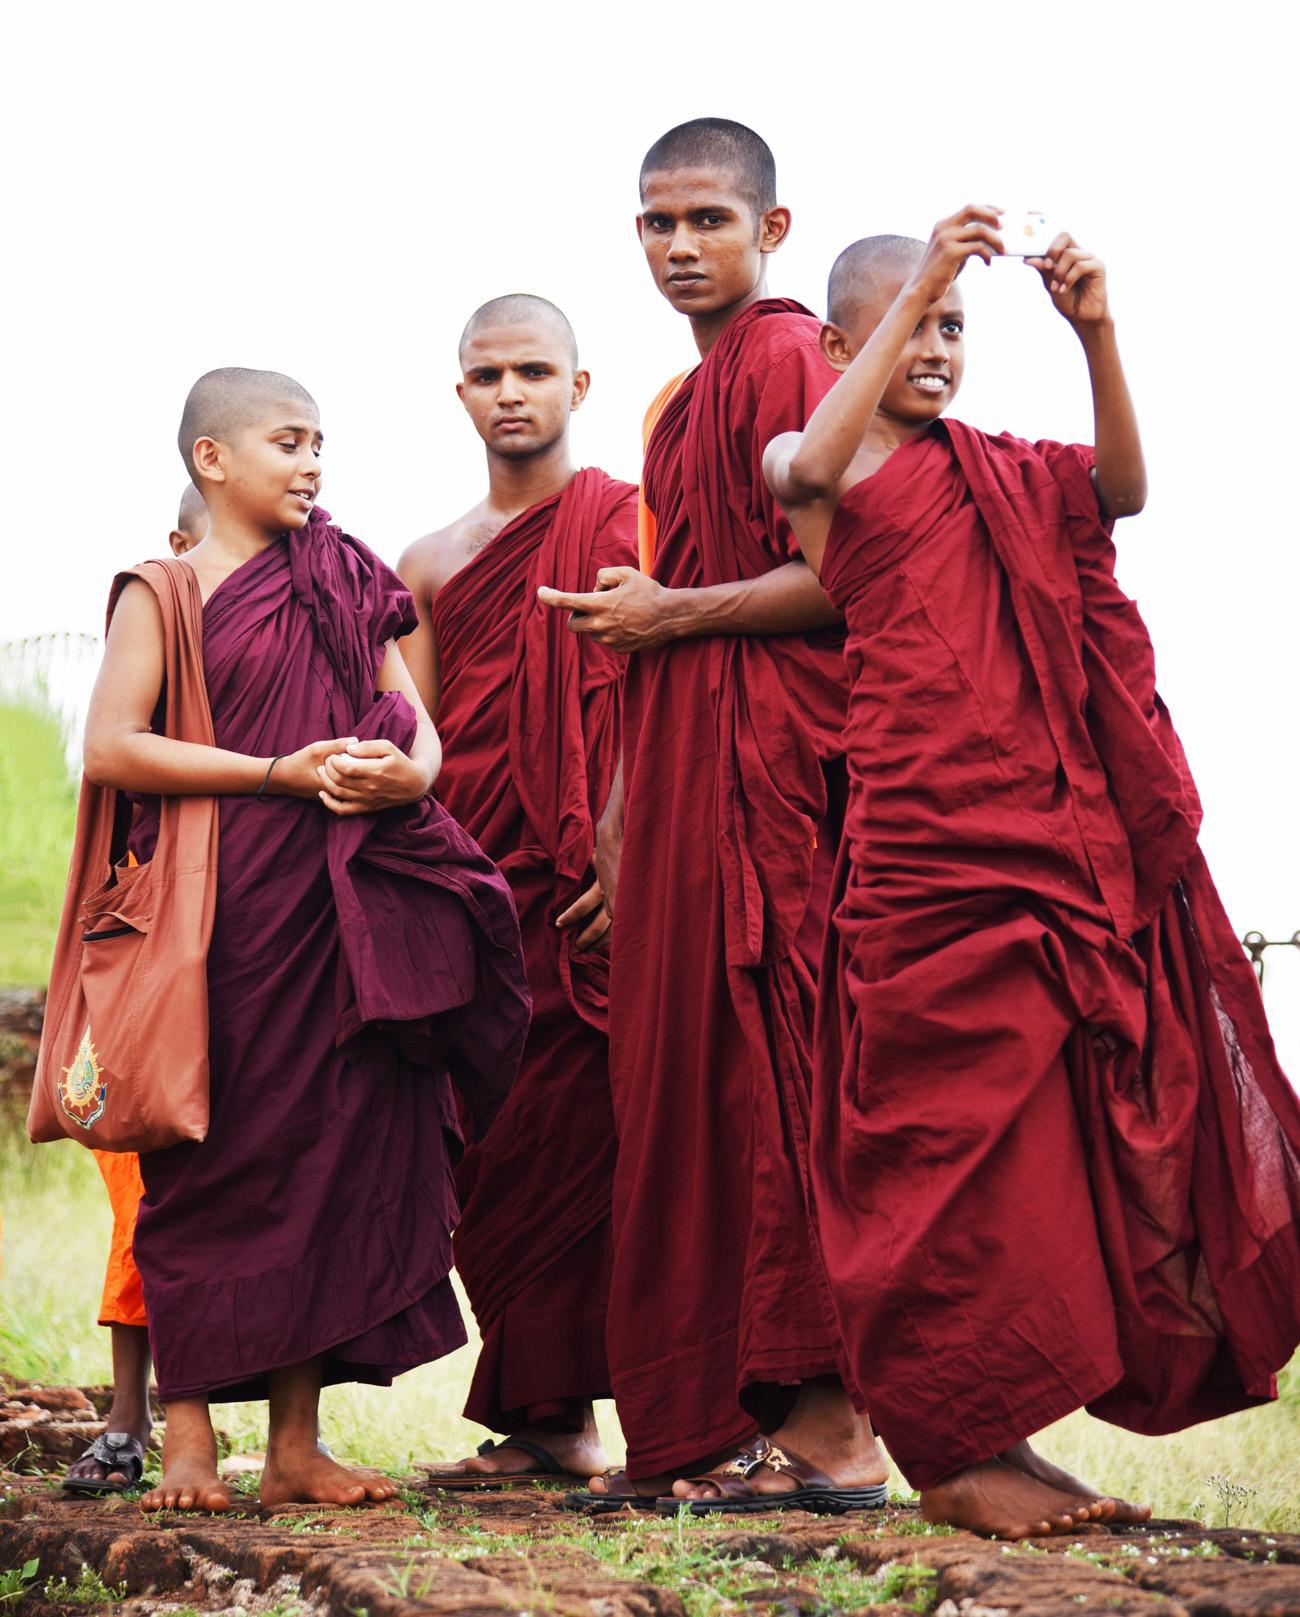 SriLanka_Monks_9